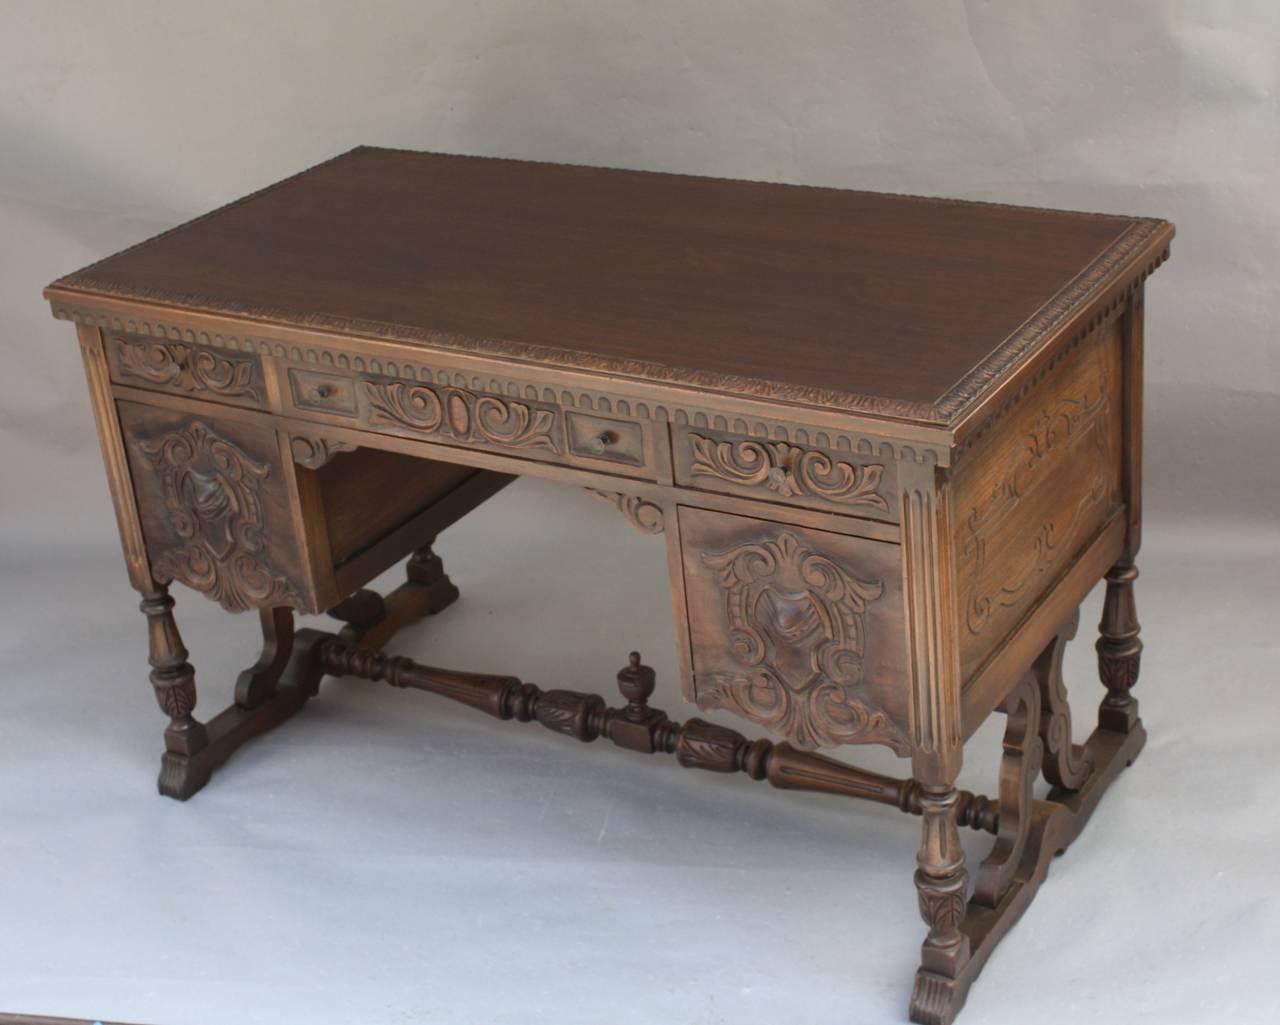 Spanish Revival Furniture images